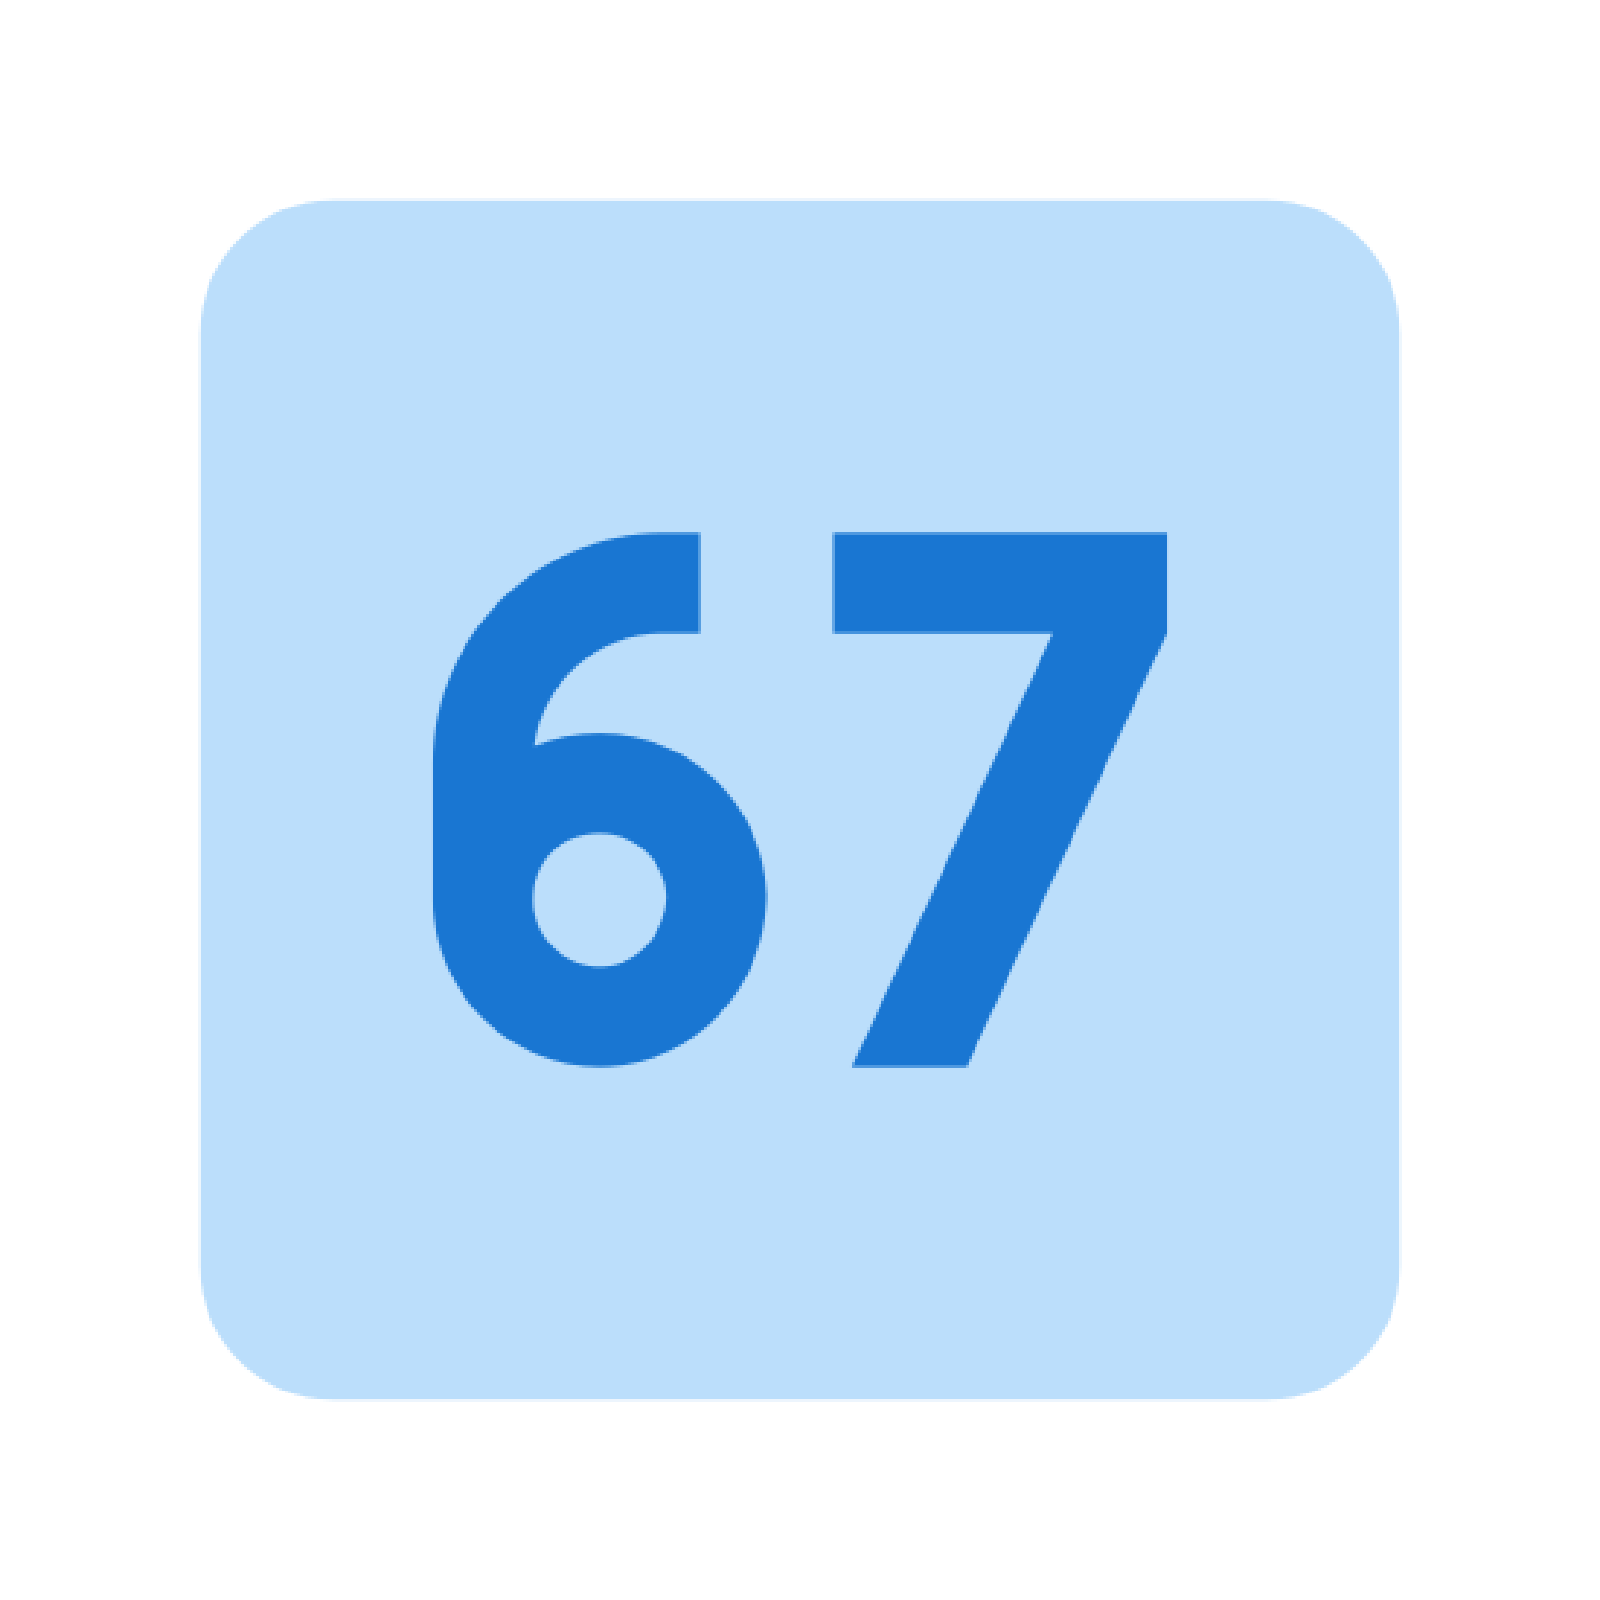 67 icon